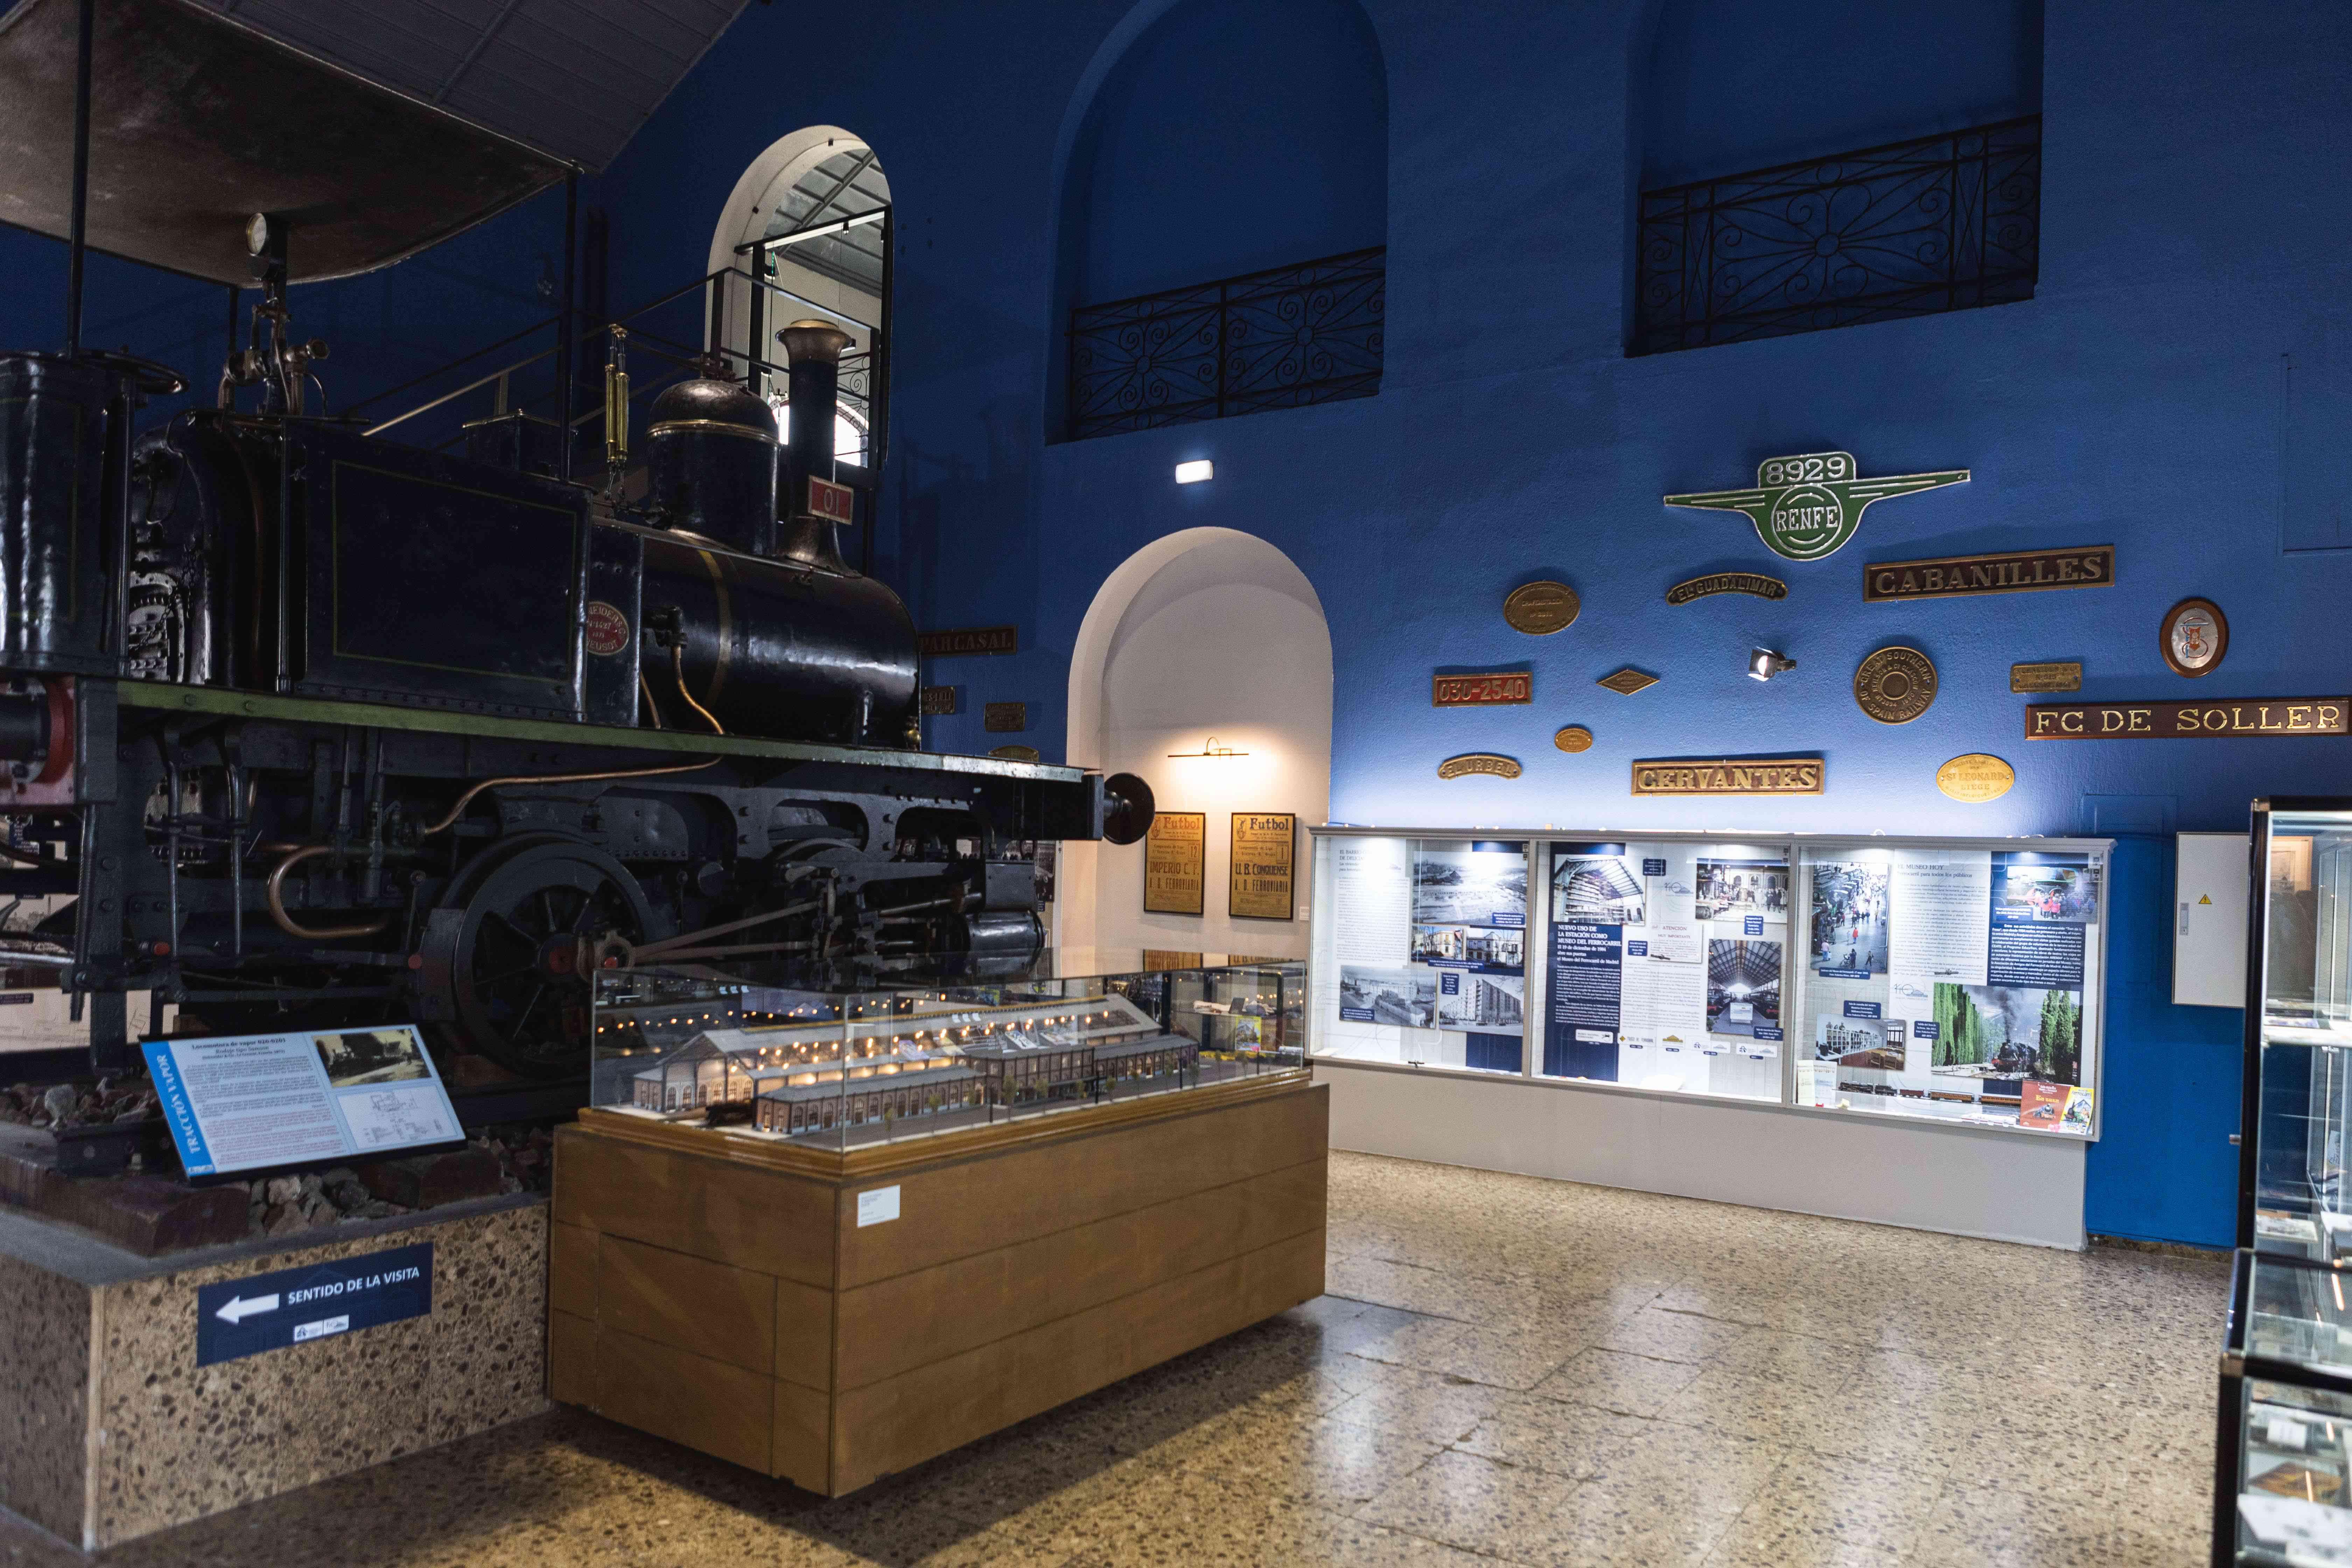 Museo del Ferrocarril in Madrid, Spain